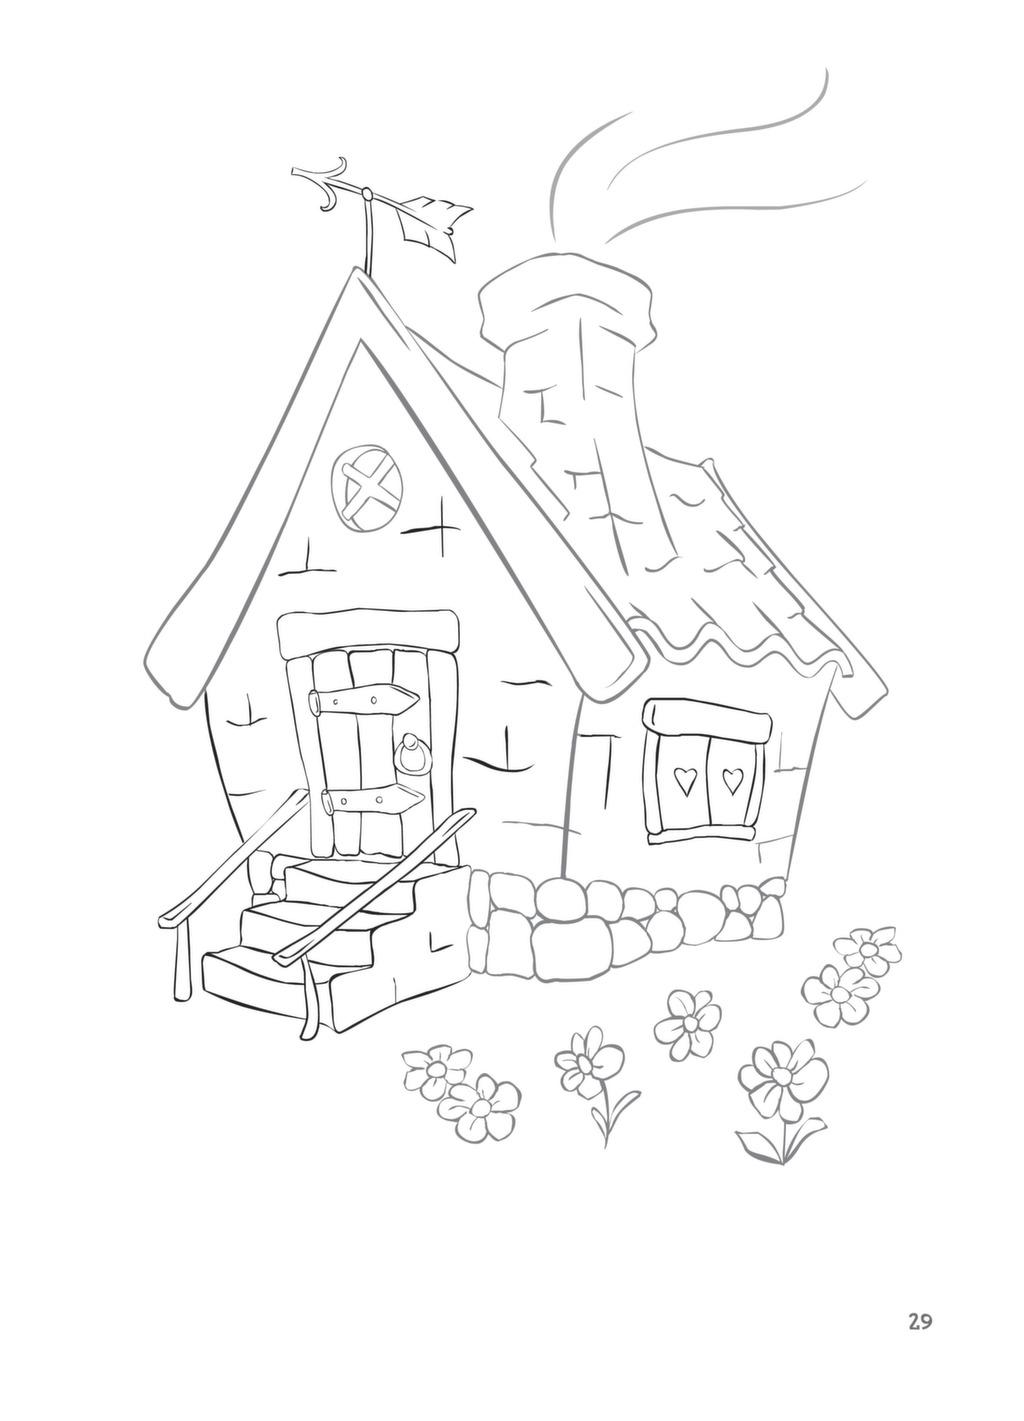 Картинки три поросенка домики раскраска